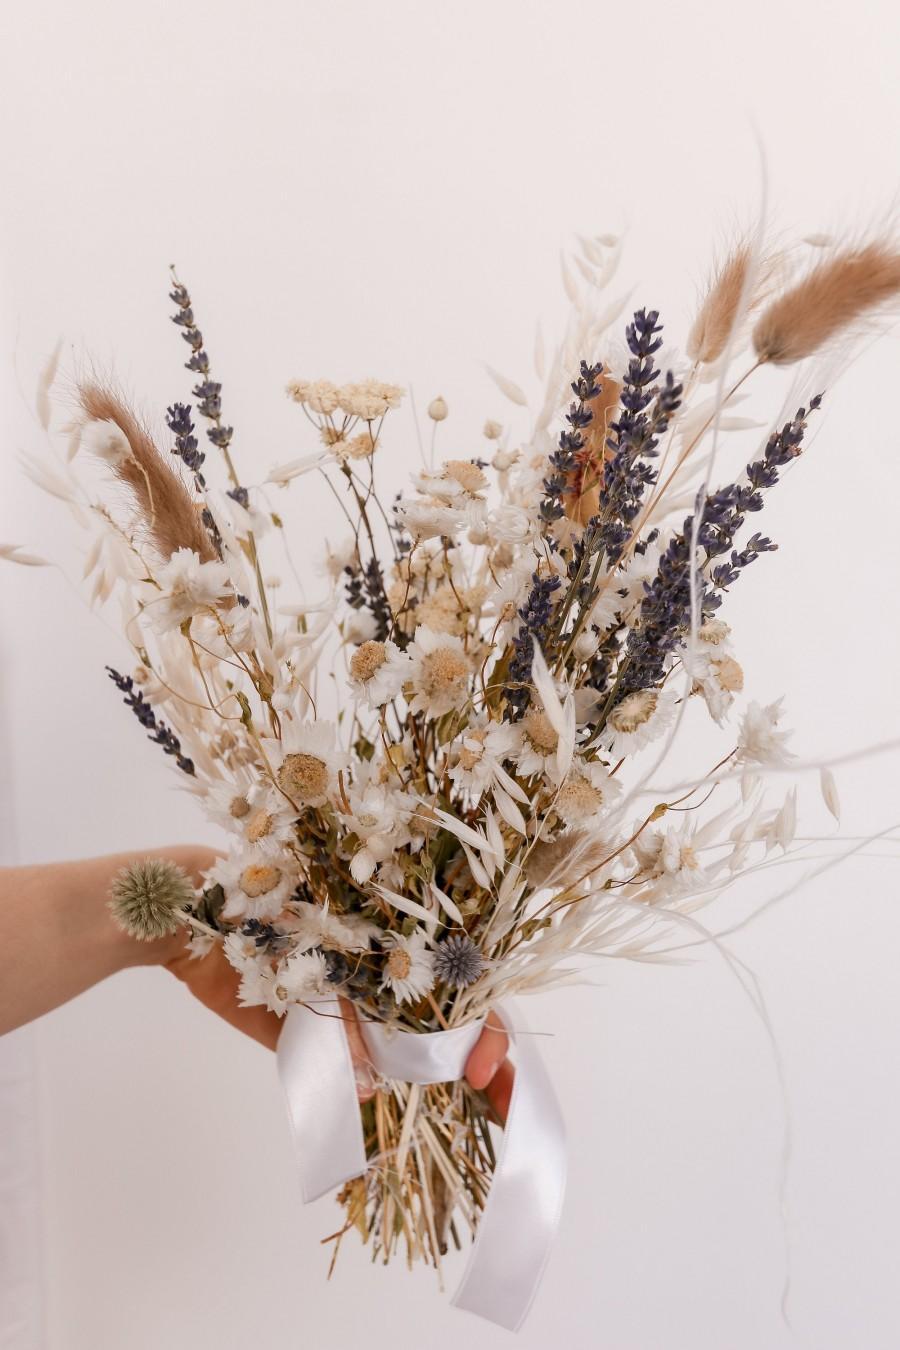 Mariage - Dried Lavender Bouquet / Dried Daisy Bouquet / Echinops Thistle Bouquet / Wildflower Bouquet / Picked Flower Bouquet